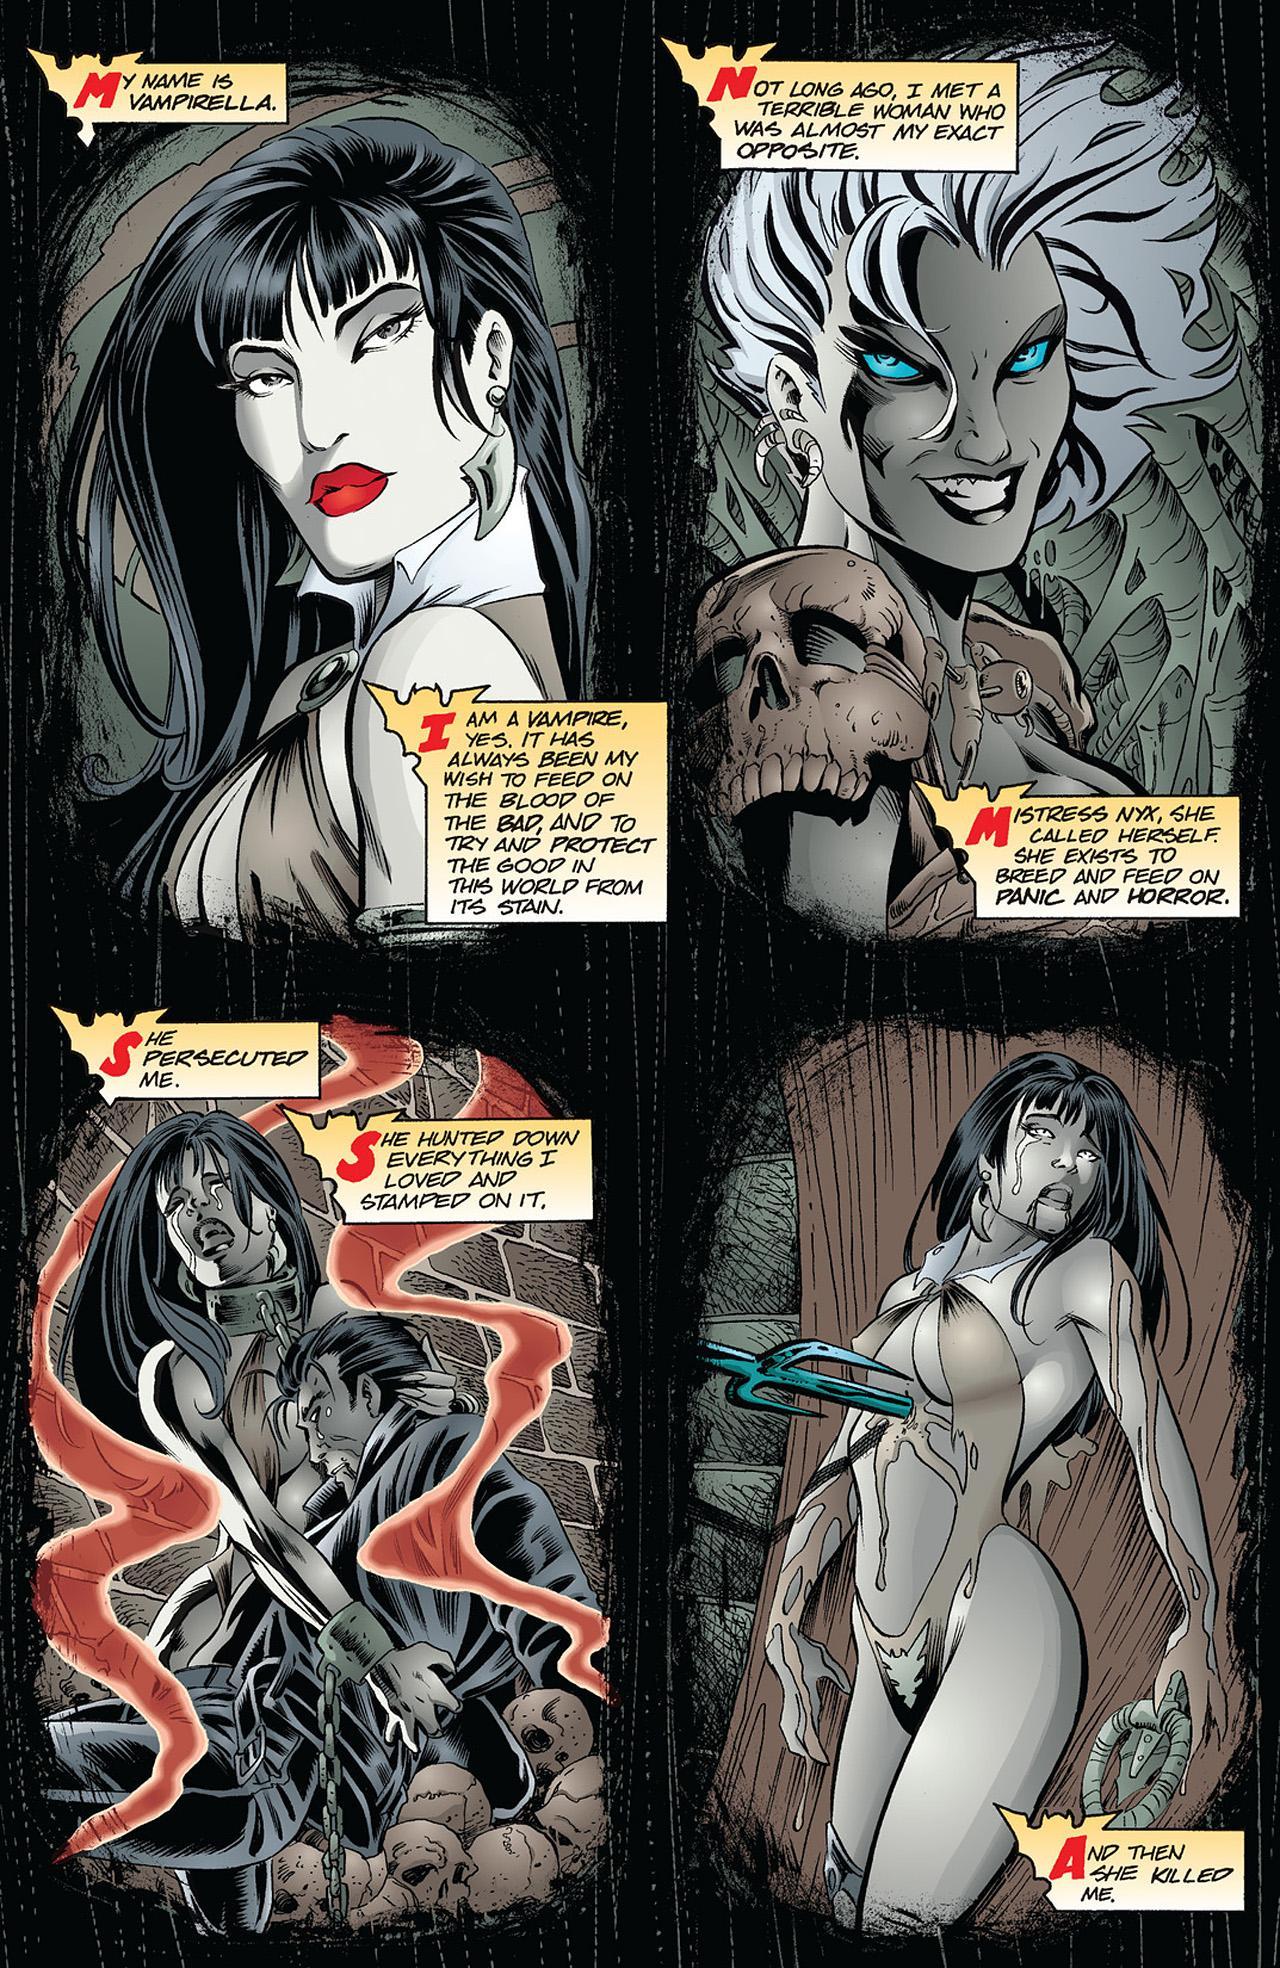 Vampirella Masters Vol 2 Warren Ellis review